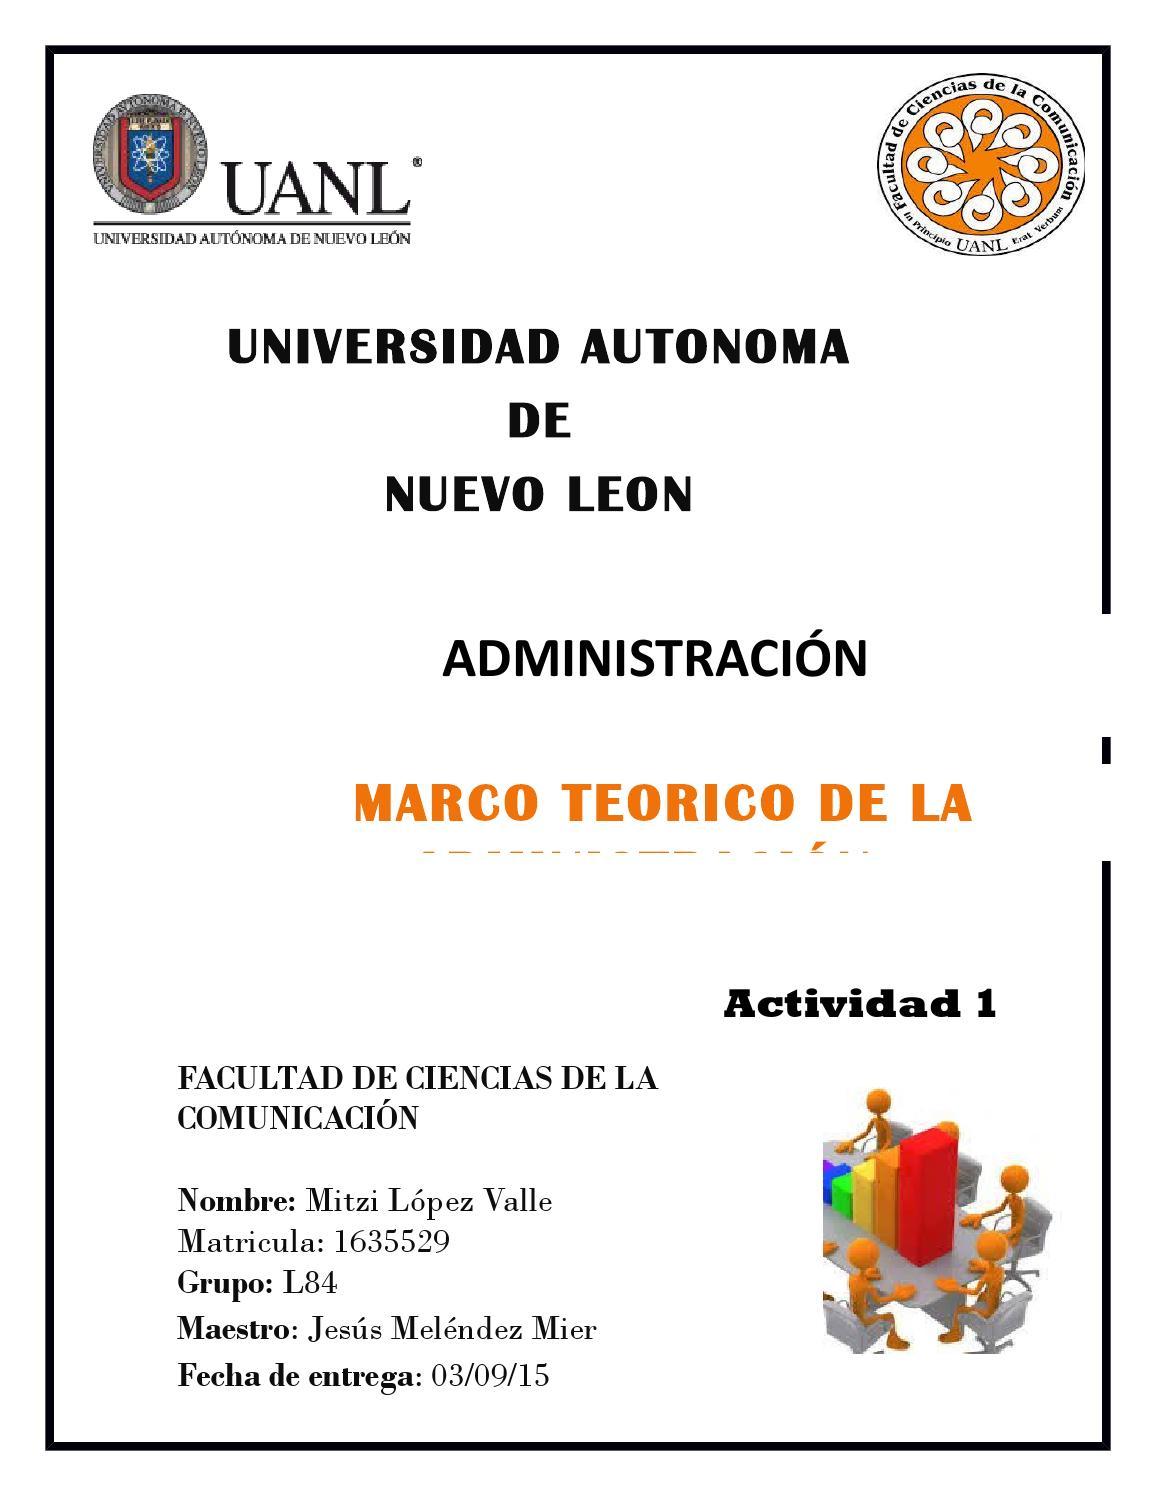 Marco teorico de administracion by Mitzi Lopez - issuu